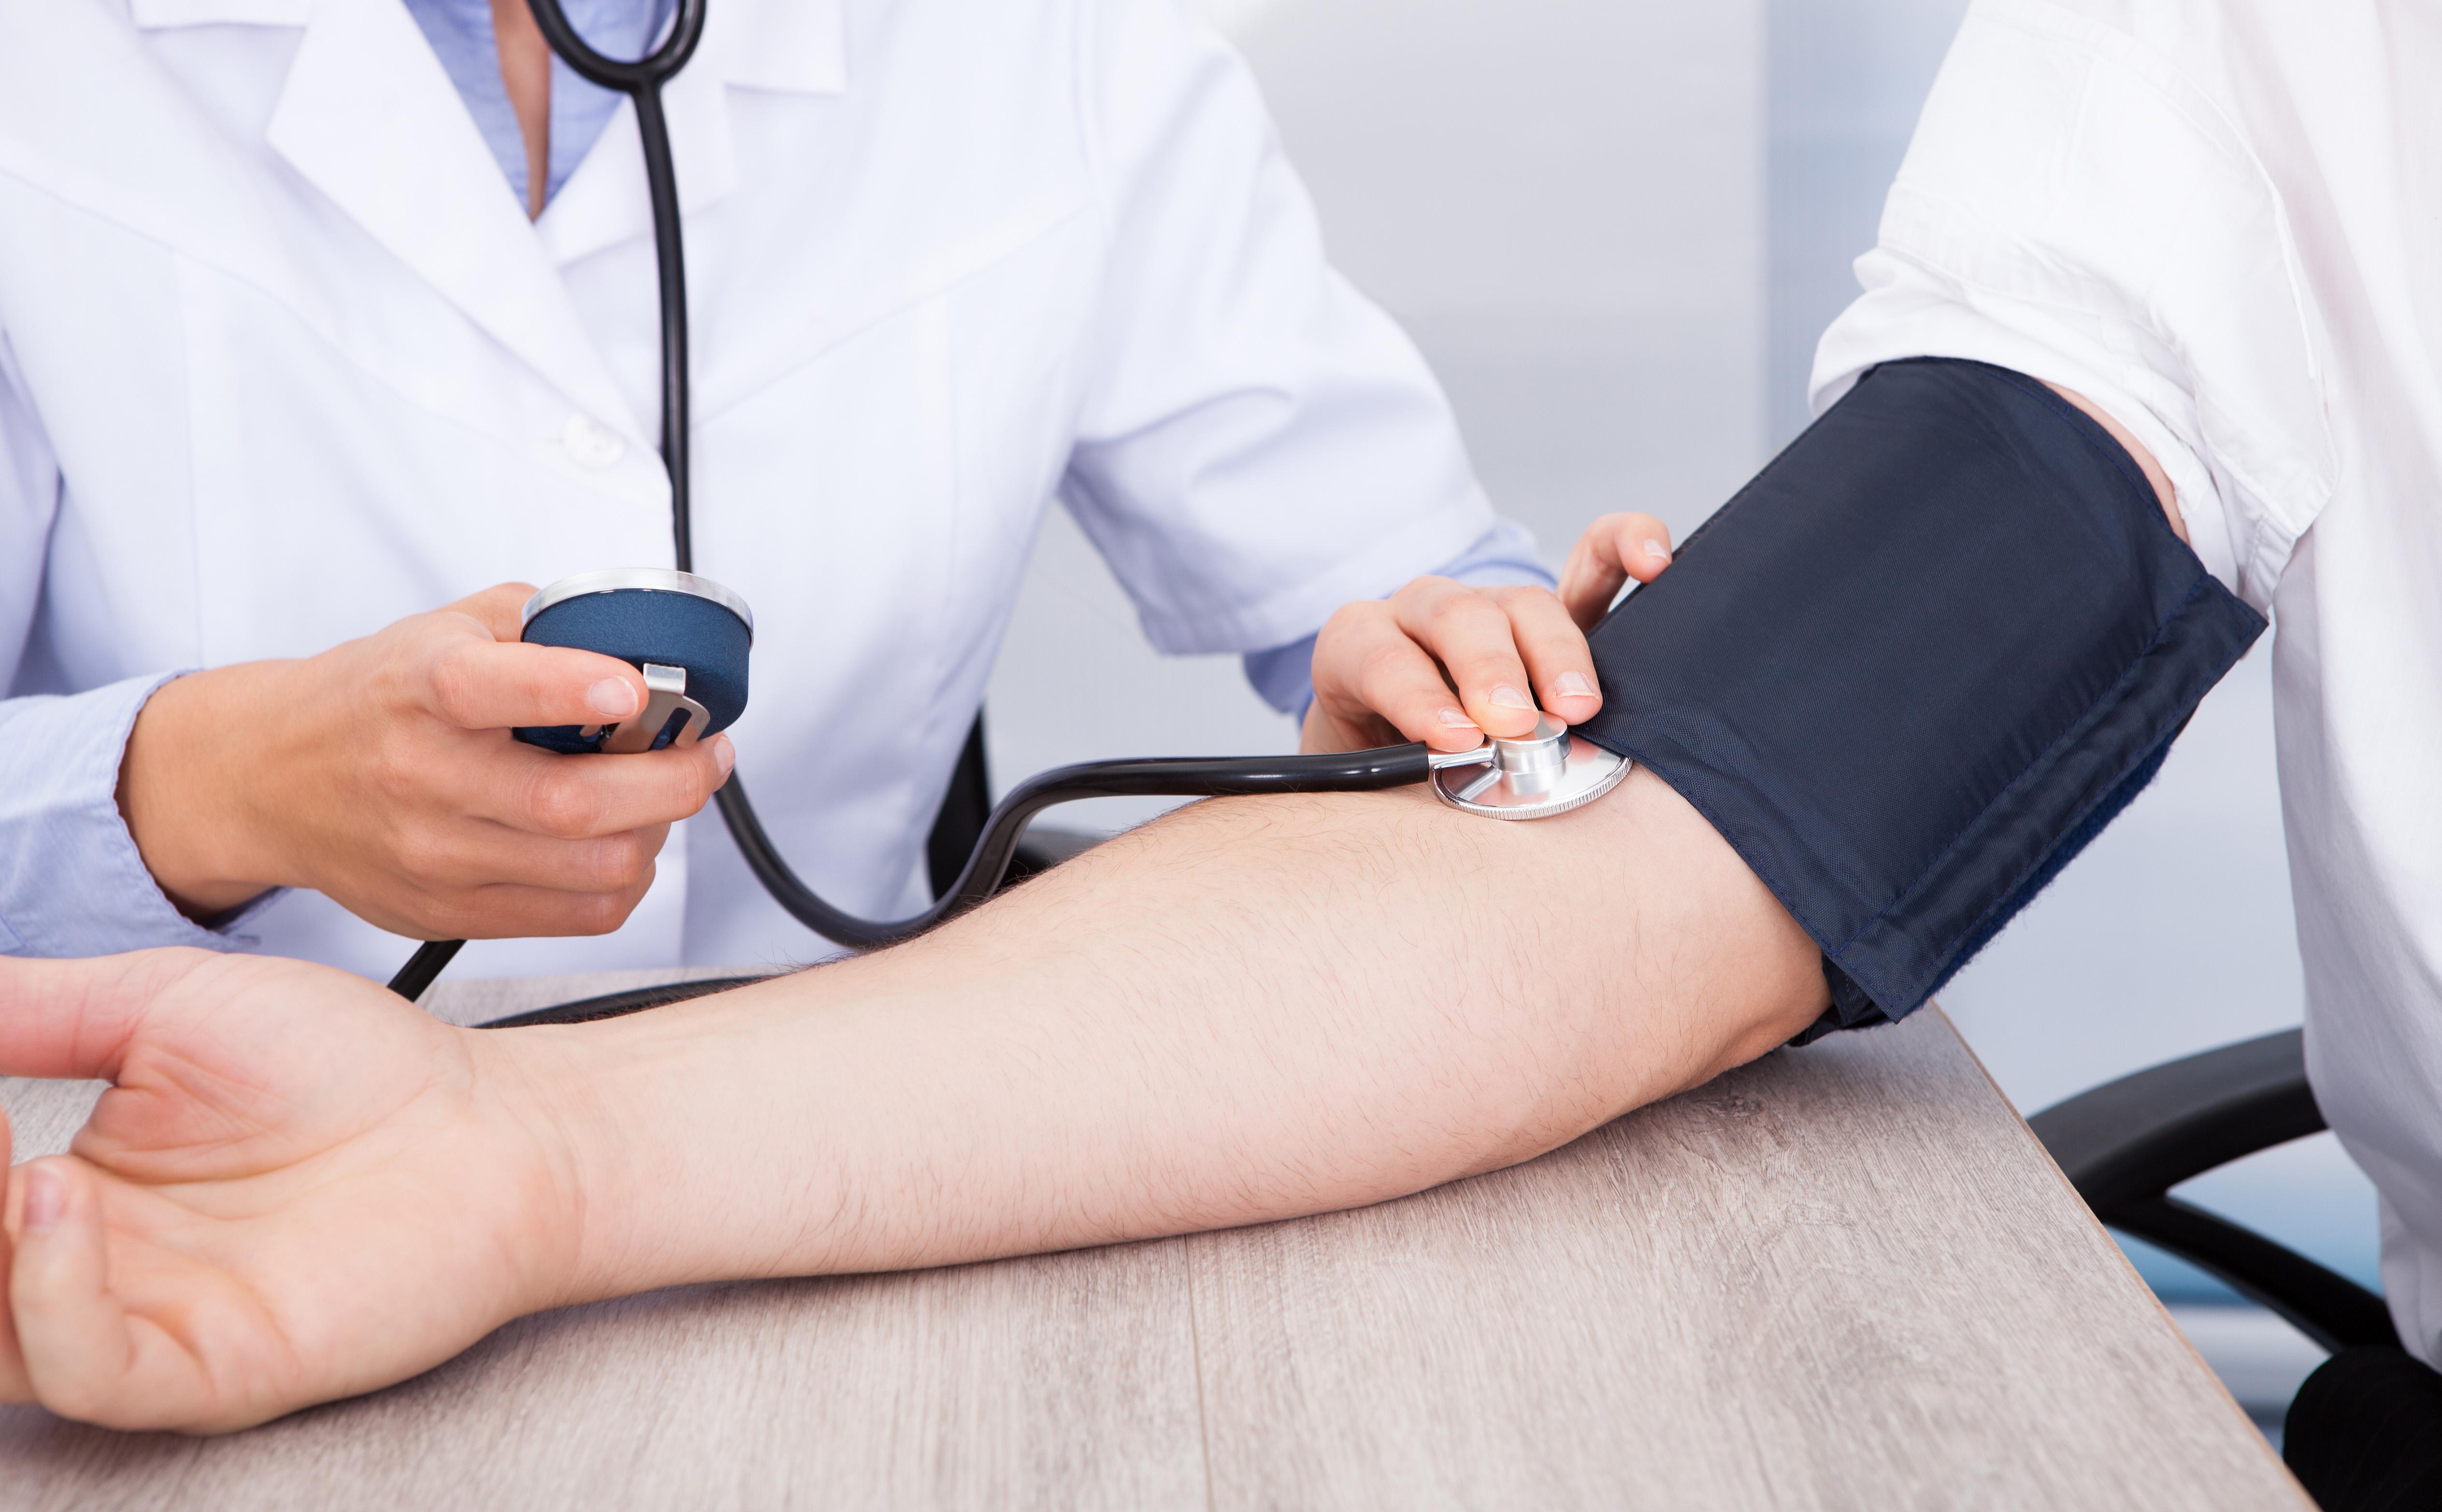 Fáj a szív magas vérnyomás miatt